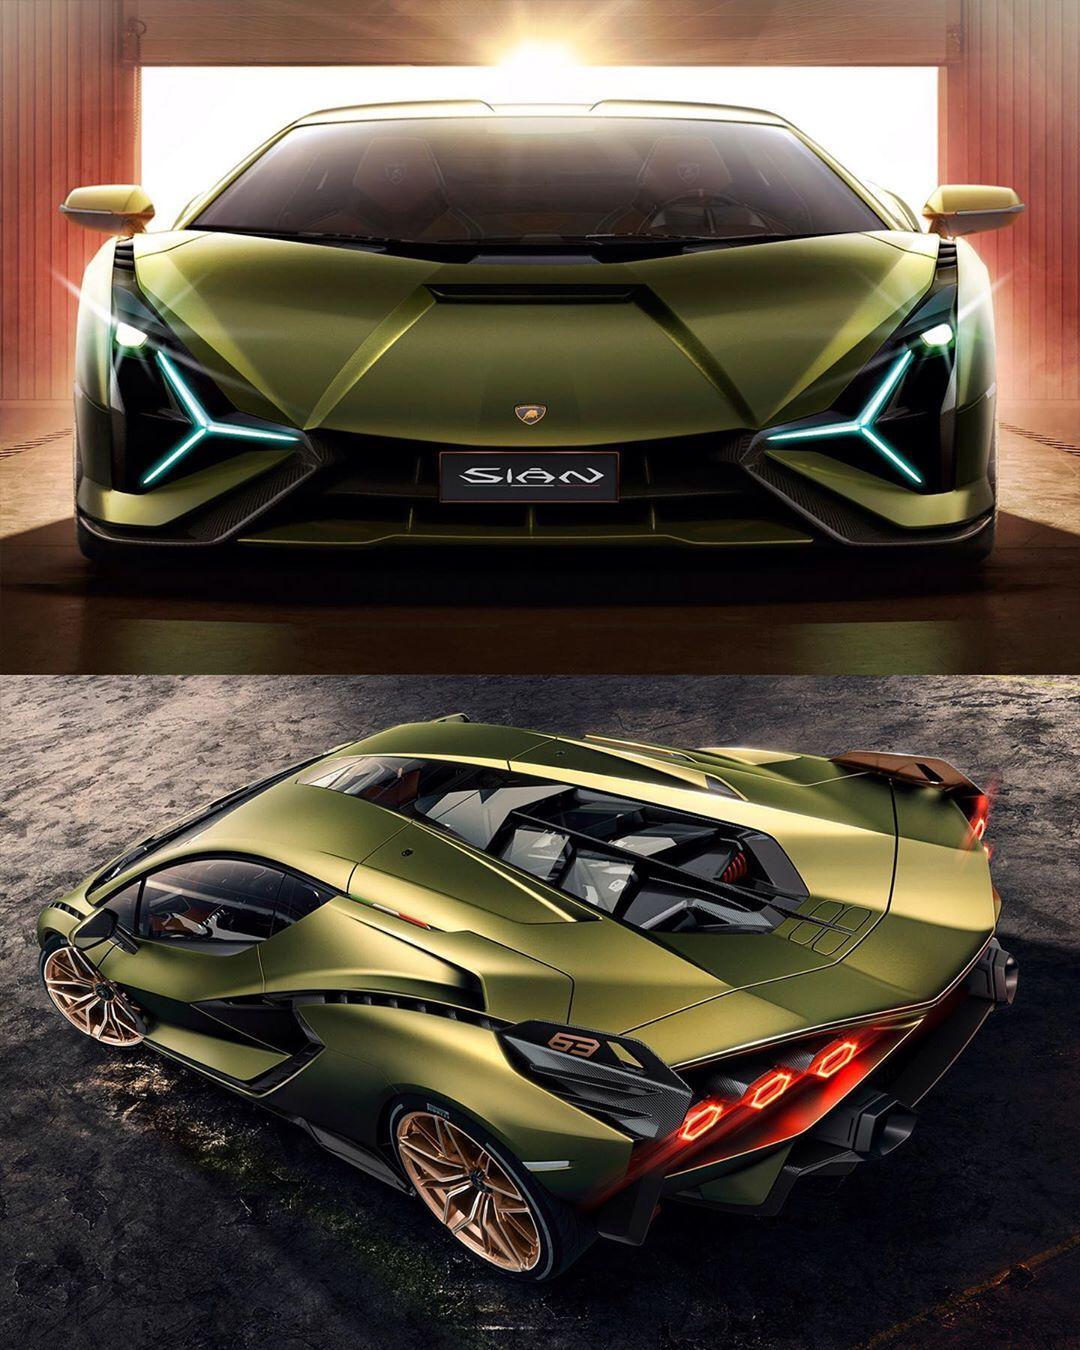 2020 Lamborghini: 2020 Lamborghini Sian Official Photos V12 + E-motor, 785